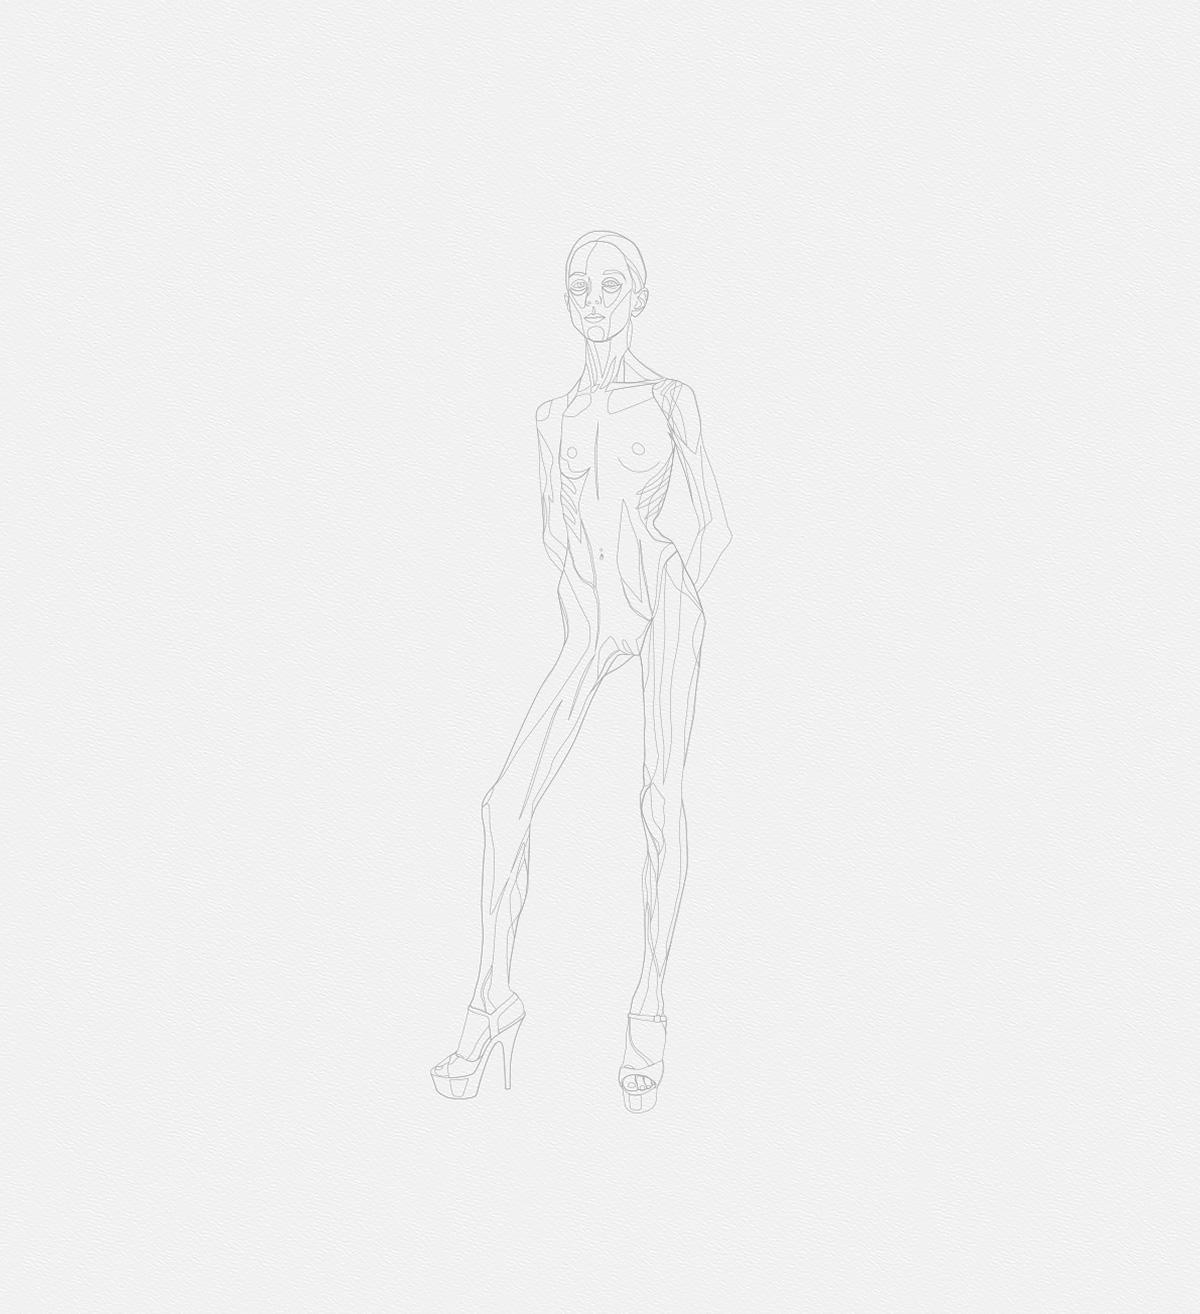 160 2016 la petite danseuse drawbot 002 resume high tty art - 2016 - La petite danseuse - Drawbot